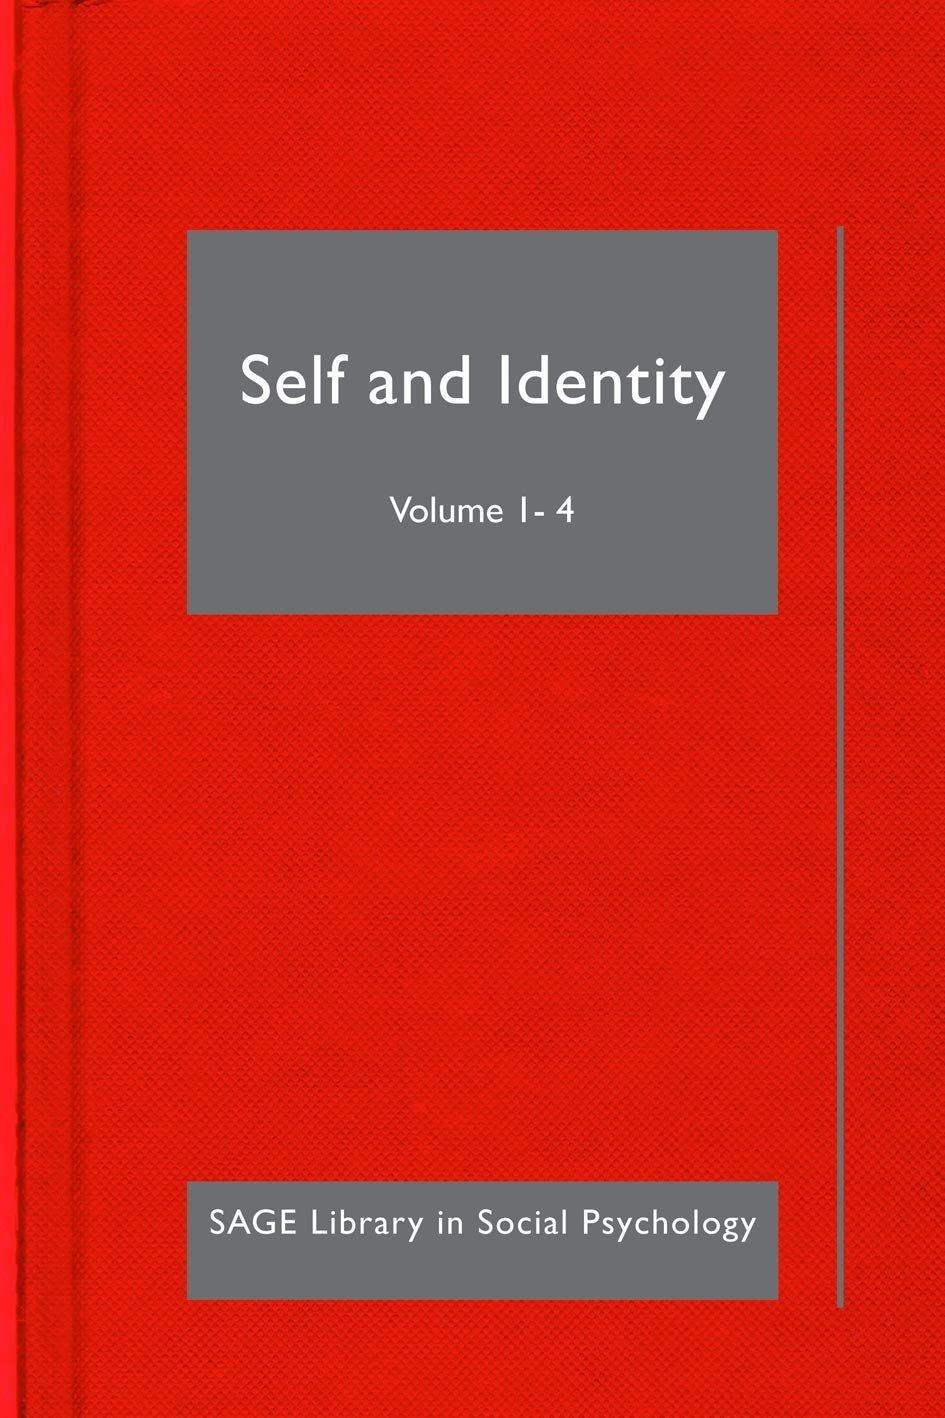 self-and-identity.jpg